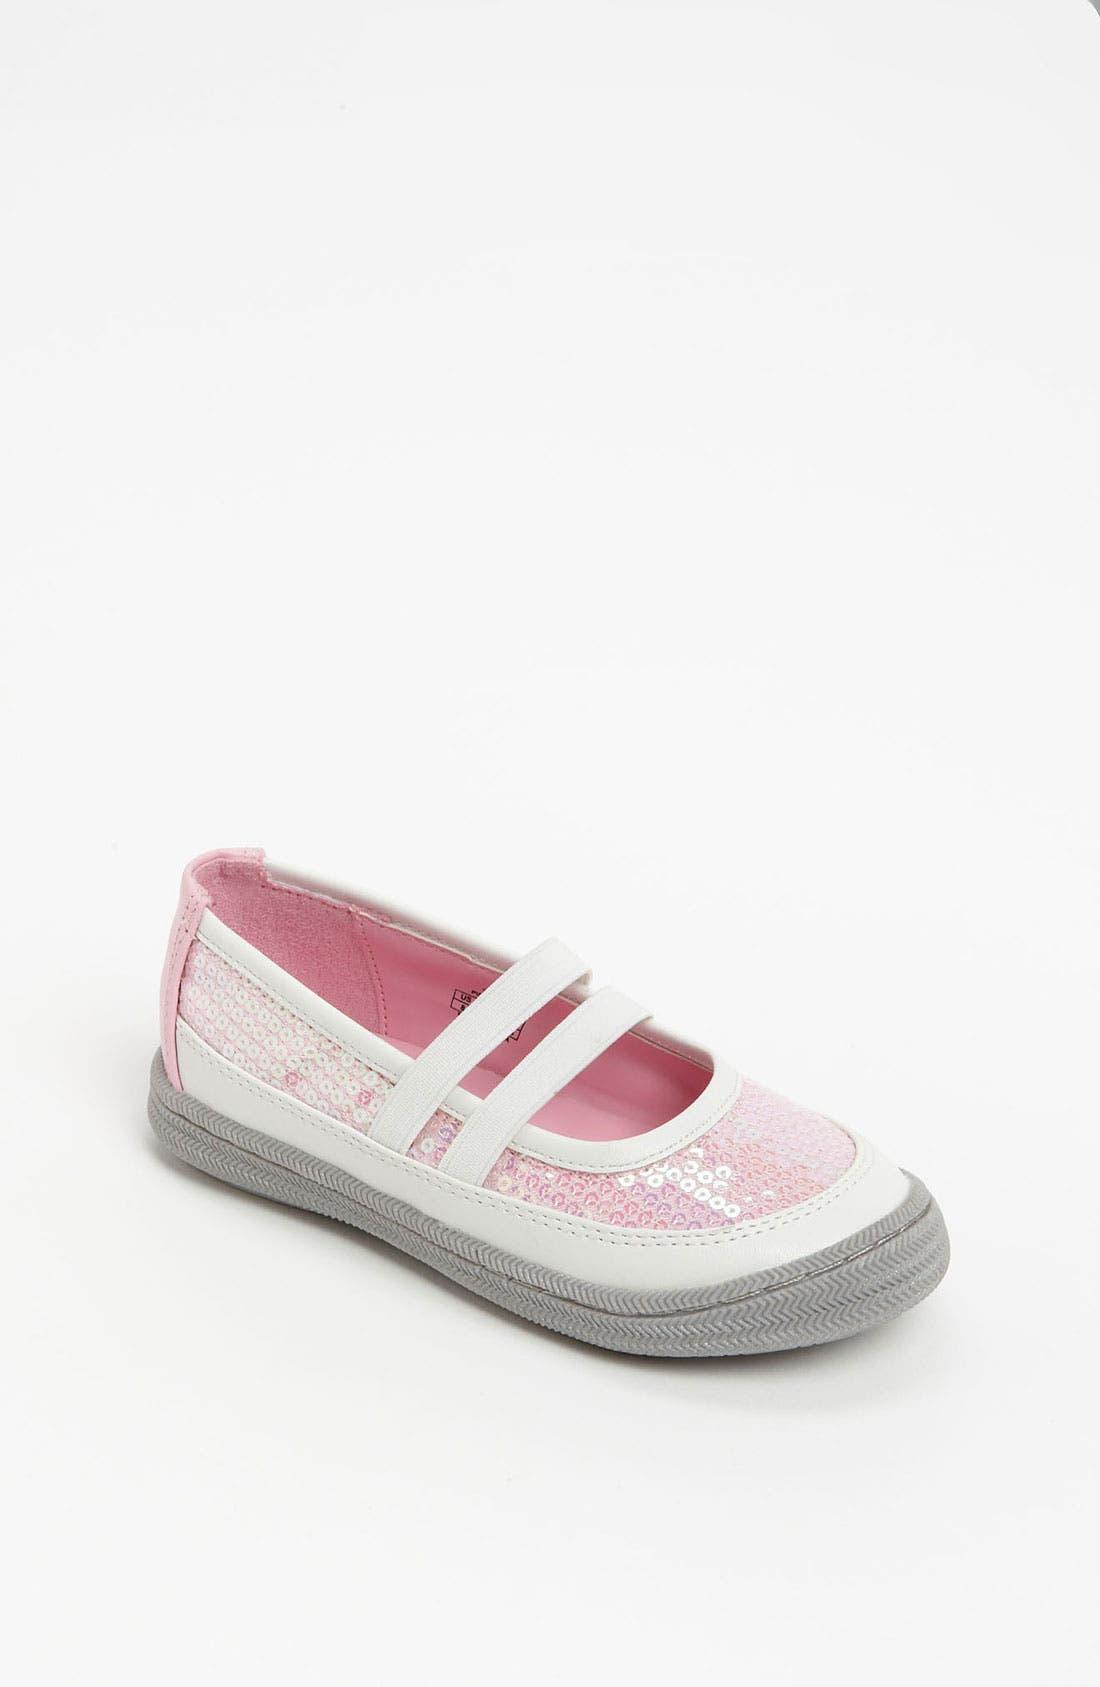 Alternate Image 1 Selected - Enzo 'Celia' Mary Jane Sneaker (Toddler)